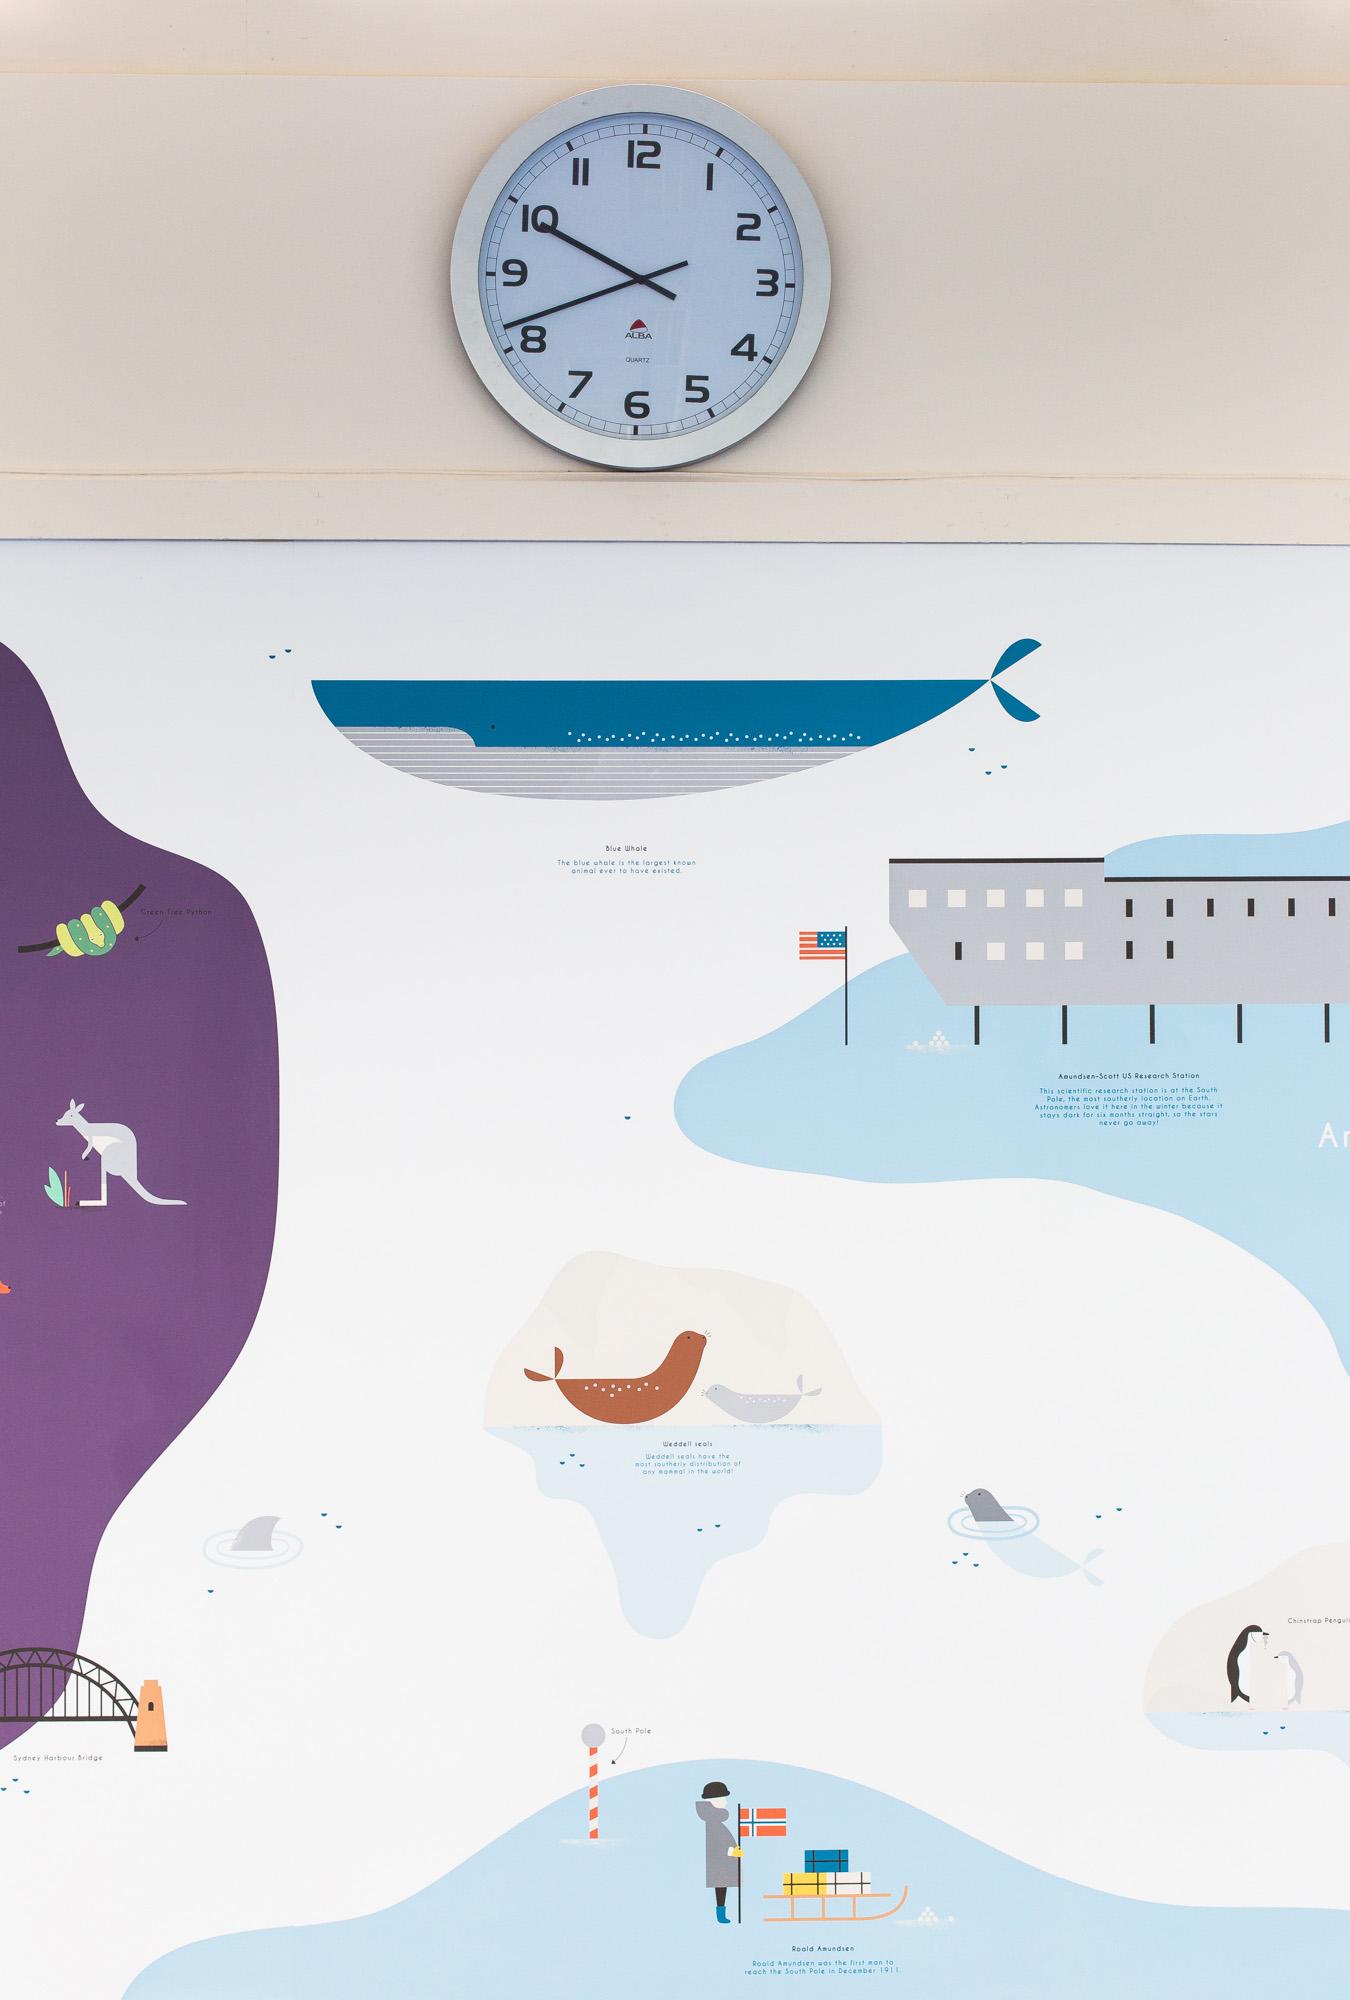 hannahalice-illustration-spacedesign-world-map-grazebrookprimaryschool-mural-antarctica-bluewhale-wallpaper.jpg